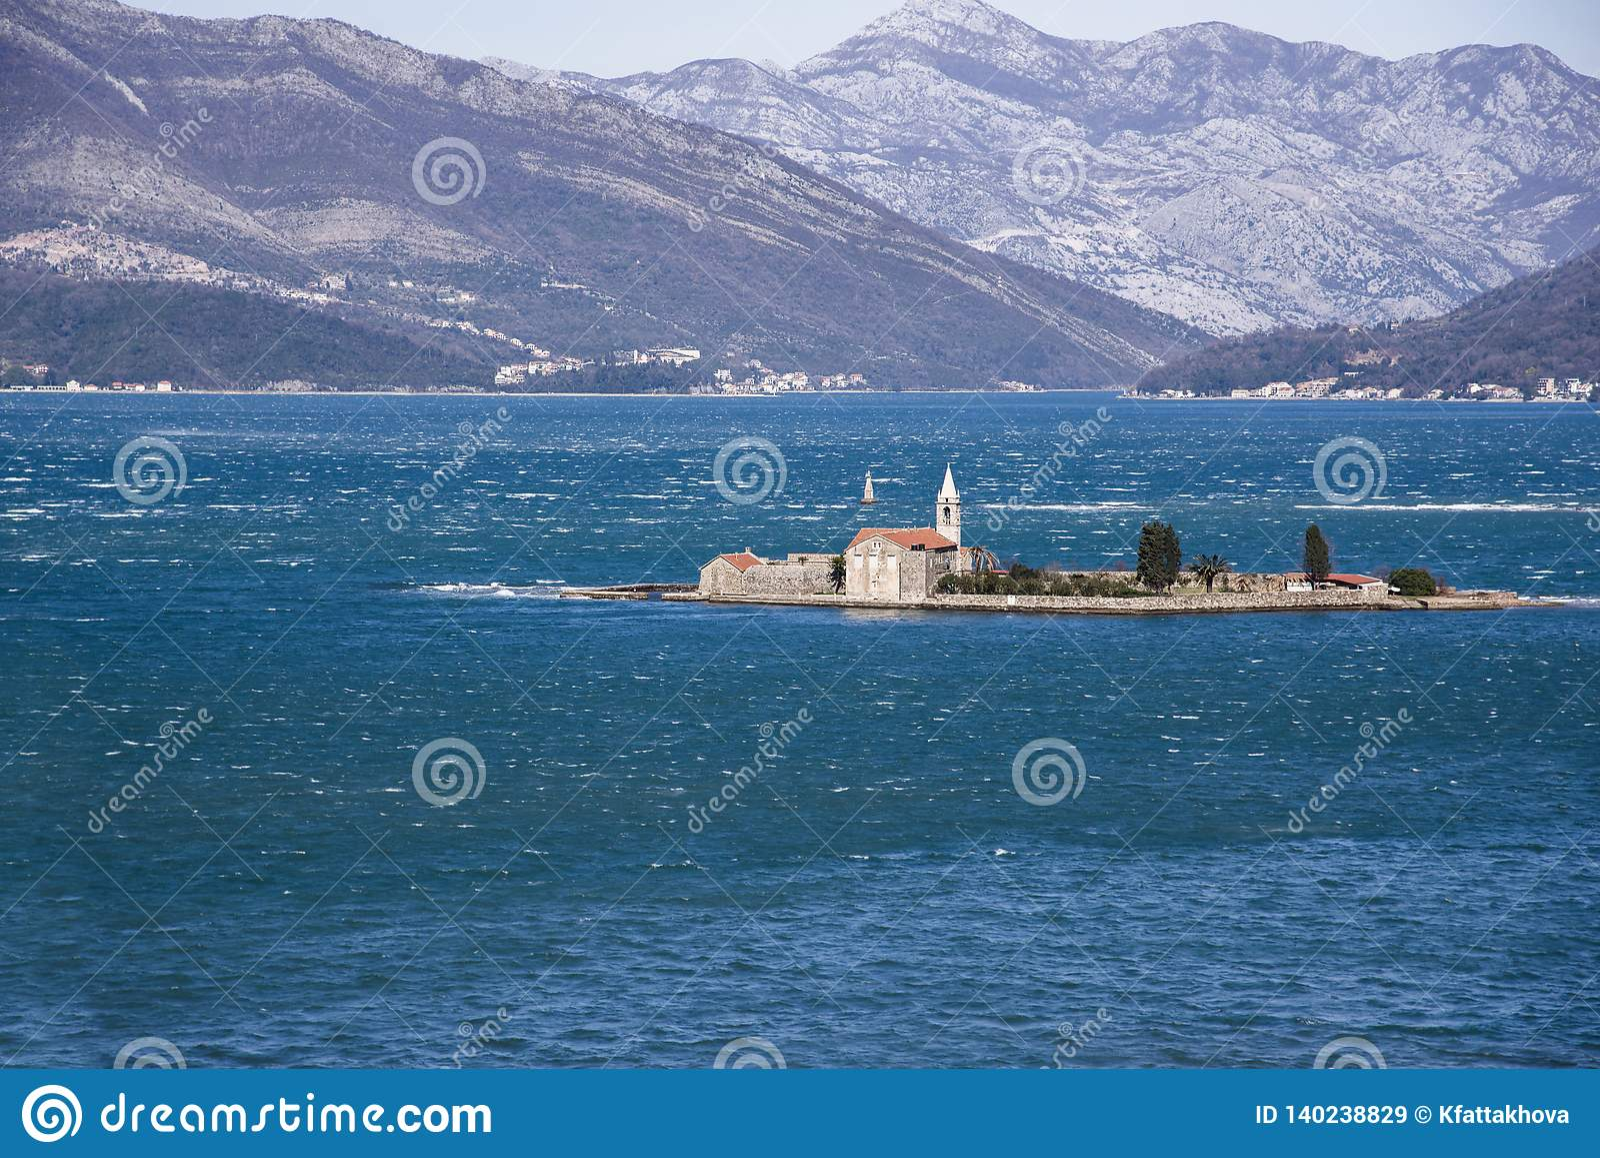 View of Otok Island Gospa od Milo Bay of Tivat, Montenegro, on a windy winter day. 2019-02-23 11:49